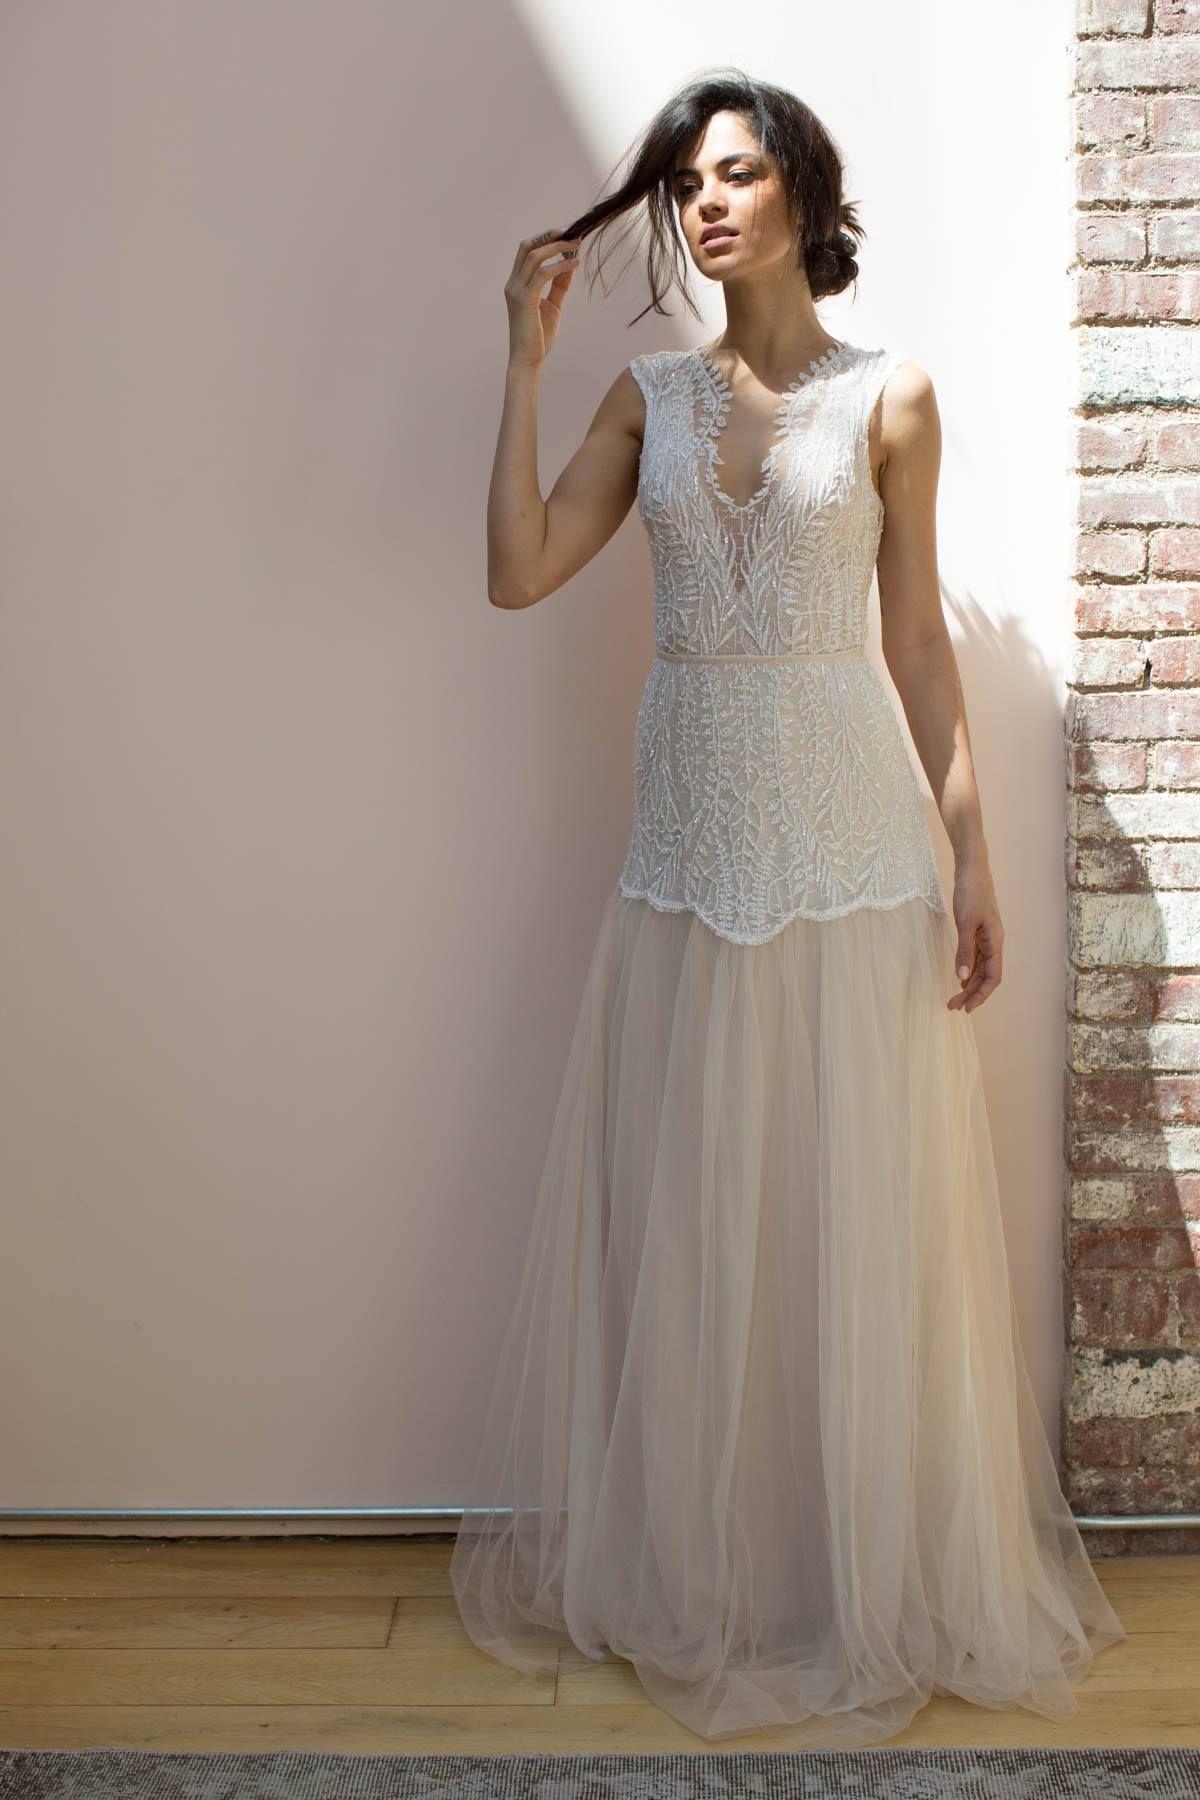 Couture wedding dresses wedding dresses backless pinterest